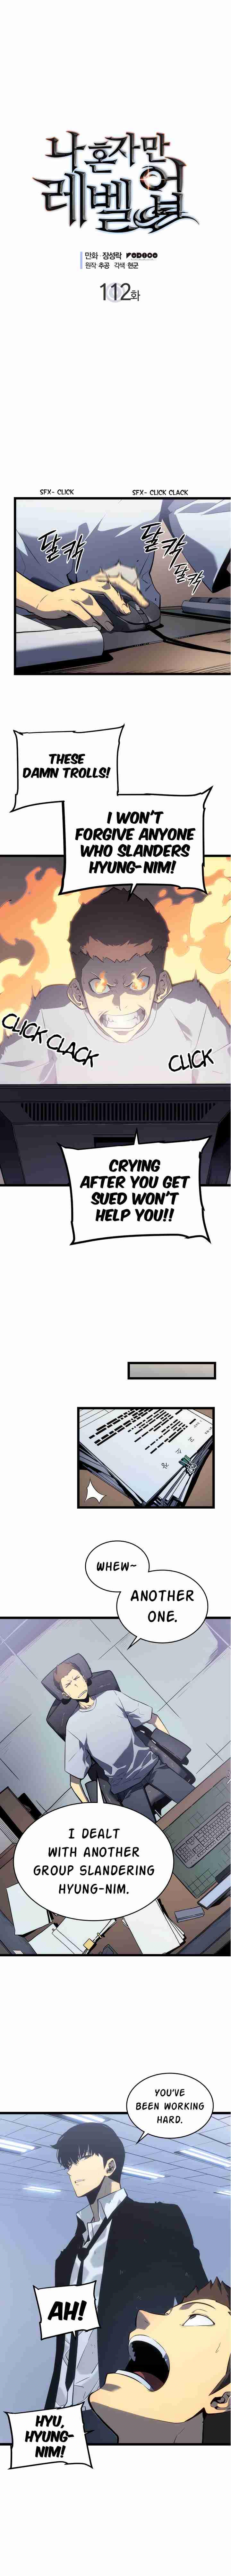 https://img2.nineanime.com/comics/pic4/35/24035/1939735/b18e8fb514012229891cf024b6436526.jpg Page 1